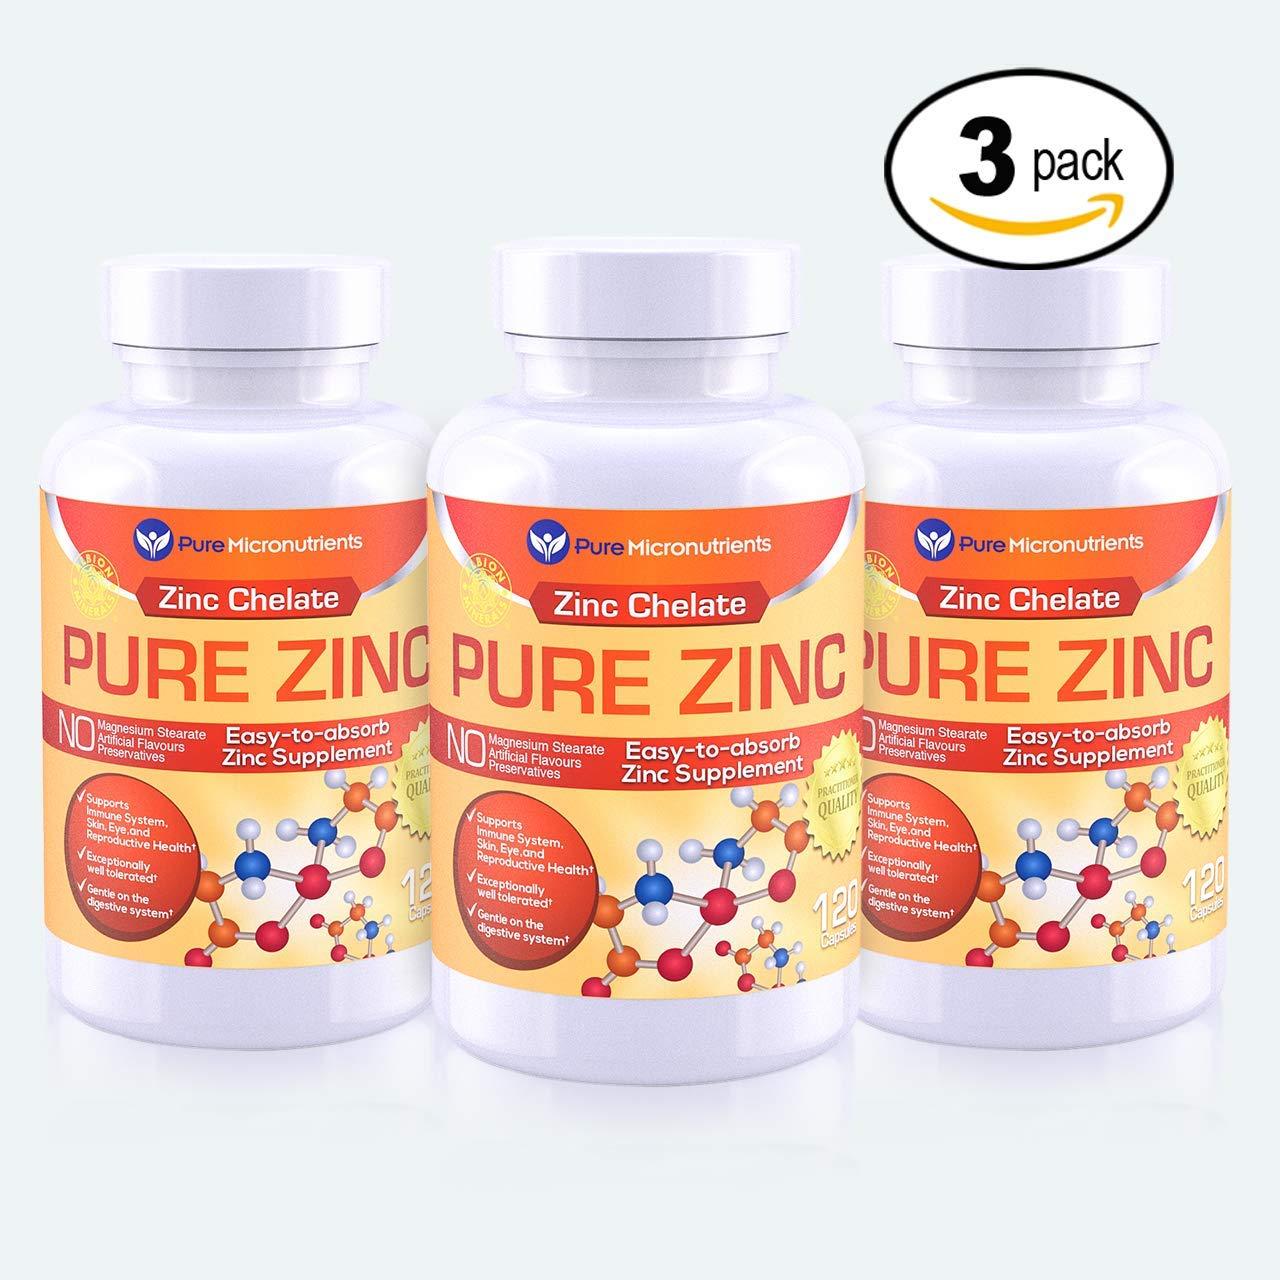 Pure Micronutrients Zinc Supplement, Natural Zinc Glycinate Supplements, (Chelated) 25mg, 120 (Mega 3 Pack!)